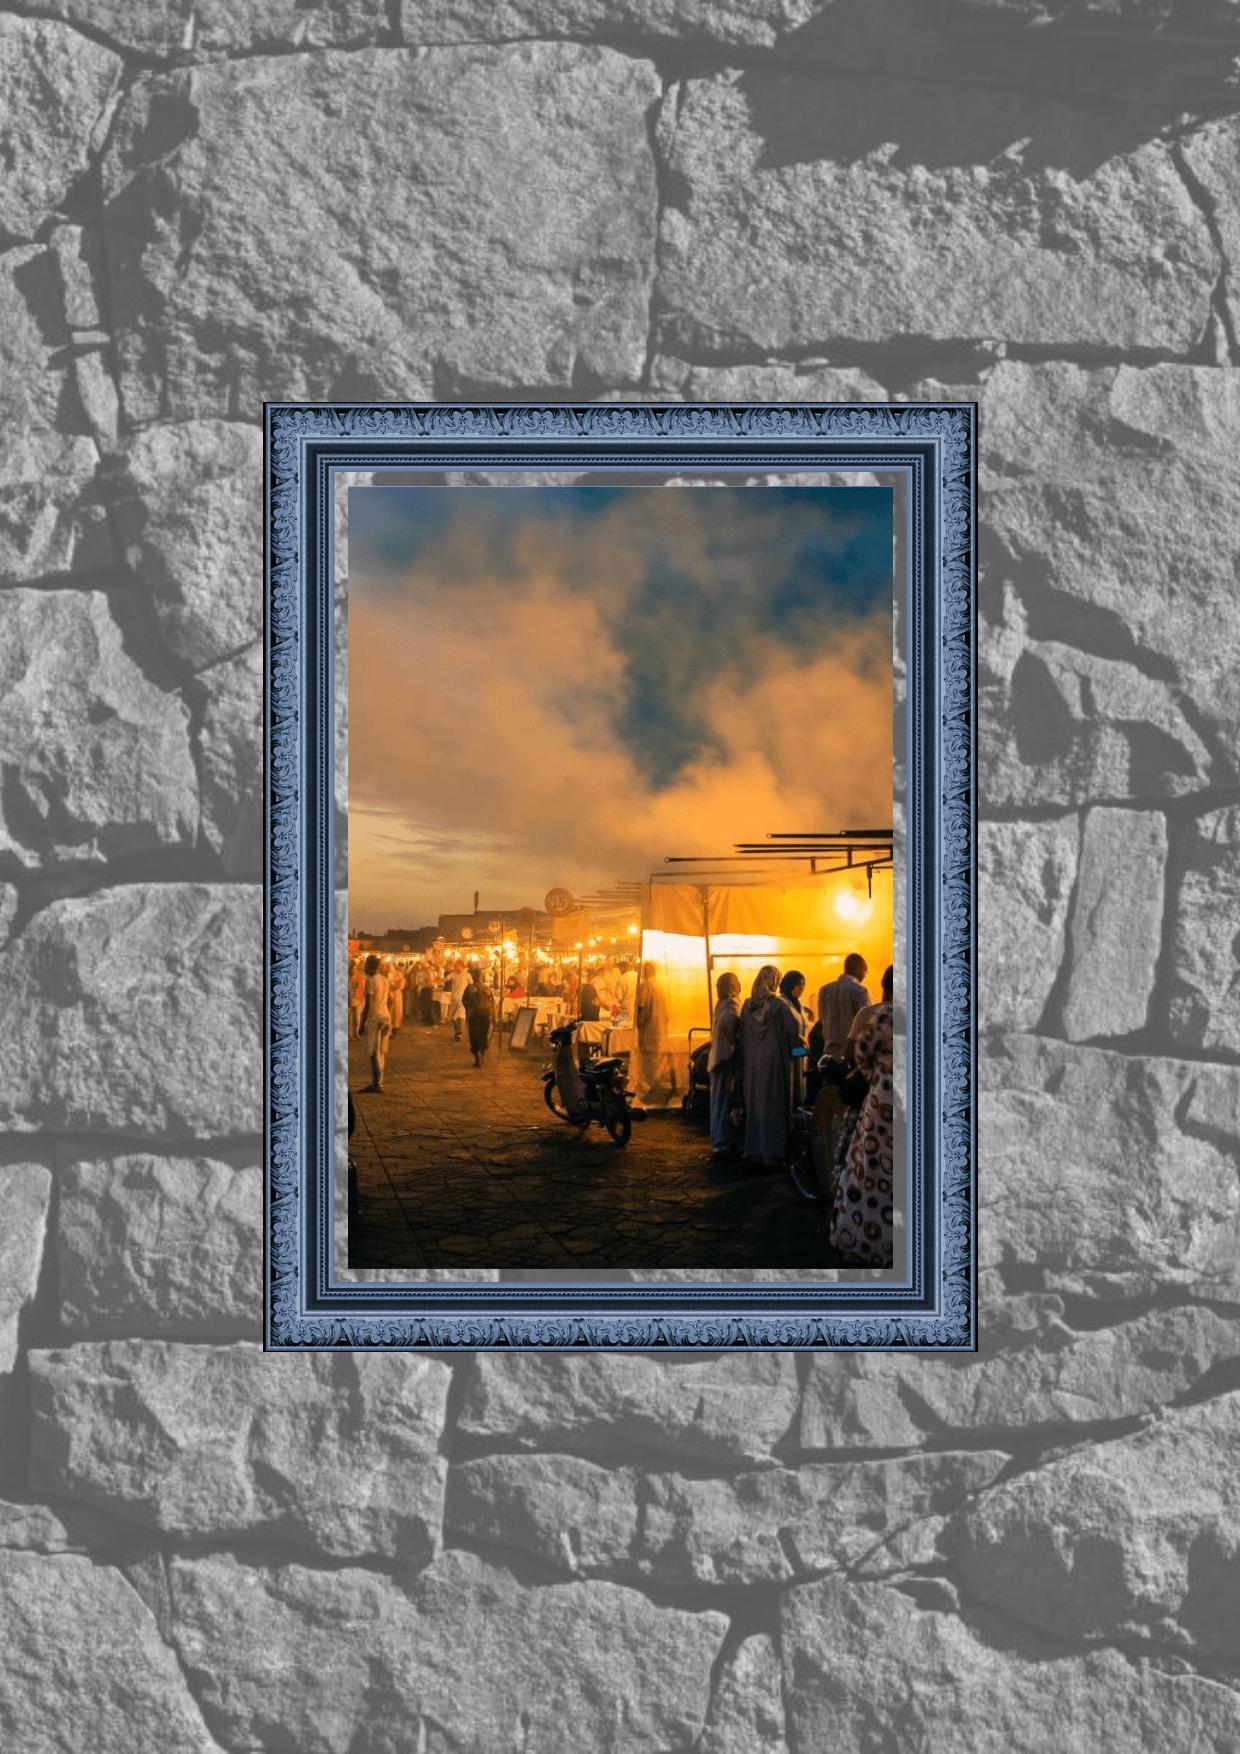 Picture,                Frame,                Wall,                Art,                Window,                Modern,                Mockup,                Image,                Avatar,                White,                Black,                 Free Image